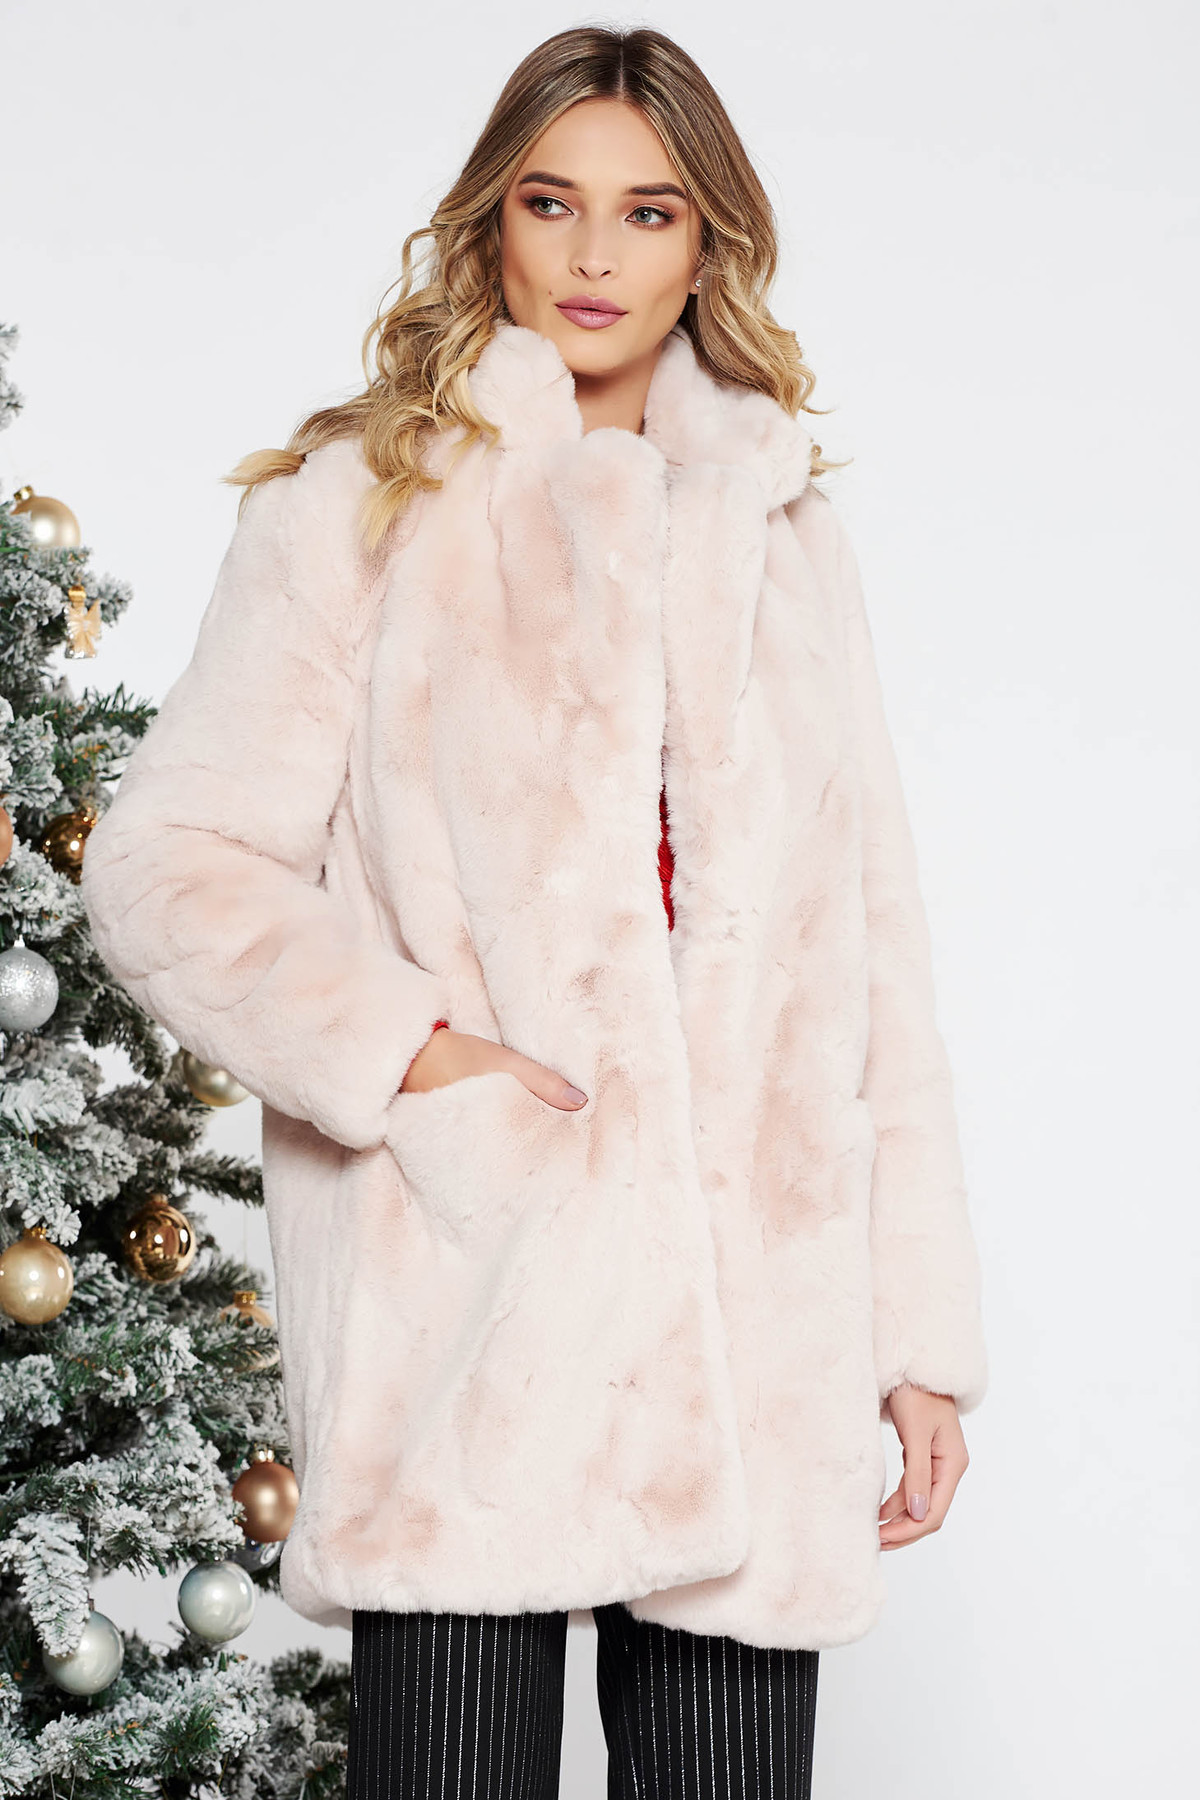 Blana roz deschis eleganta din blana ecologica captusita pe interior cu buzunare